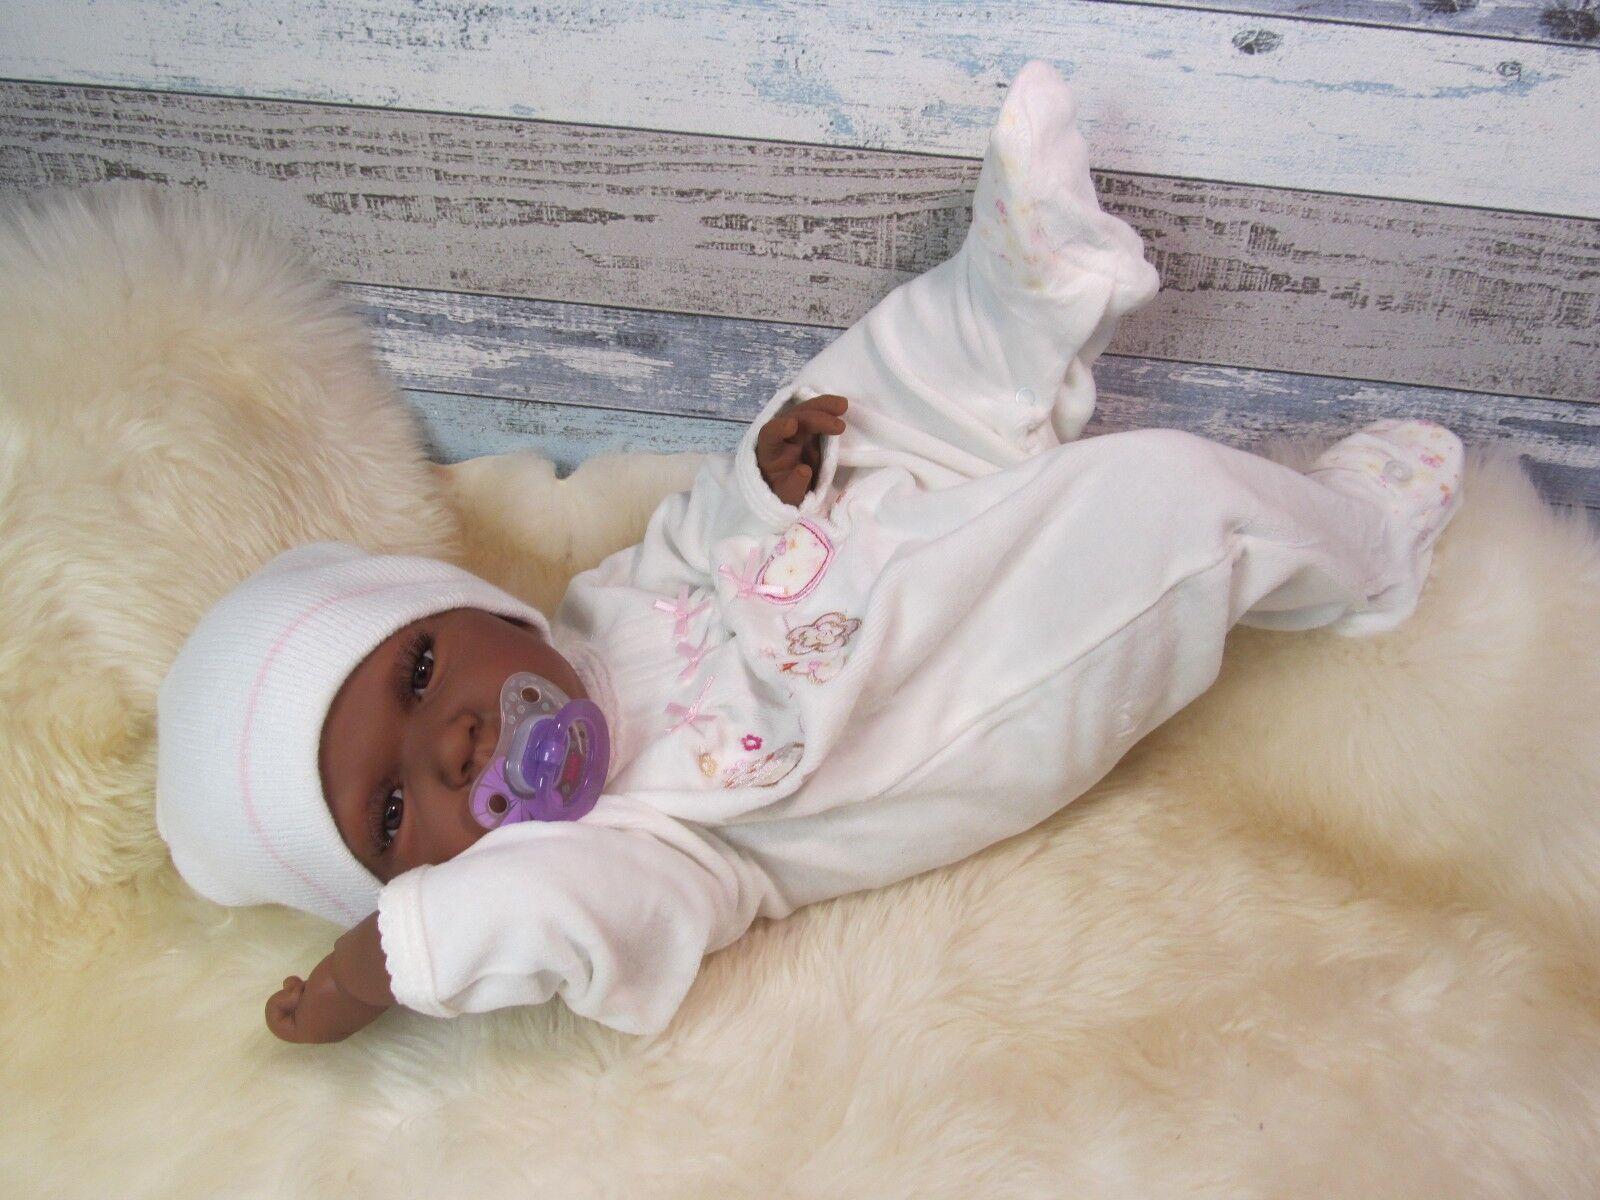 Ninisingen rebornbaby Reborn Naila ragazza BABY BAMBOLA BABY VINILE pieno